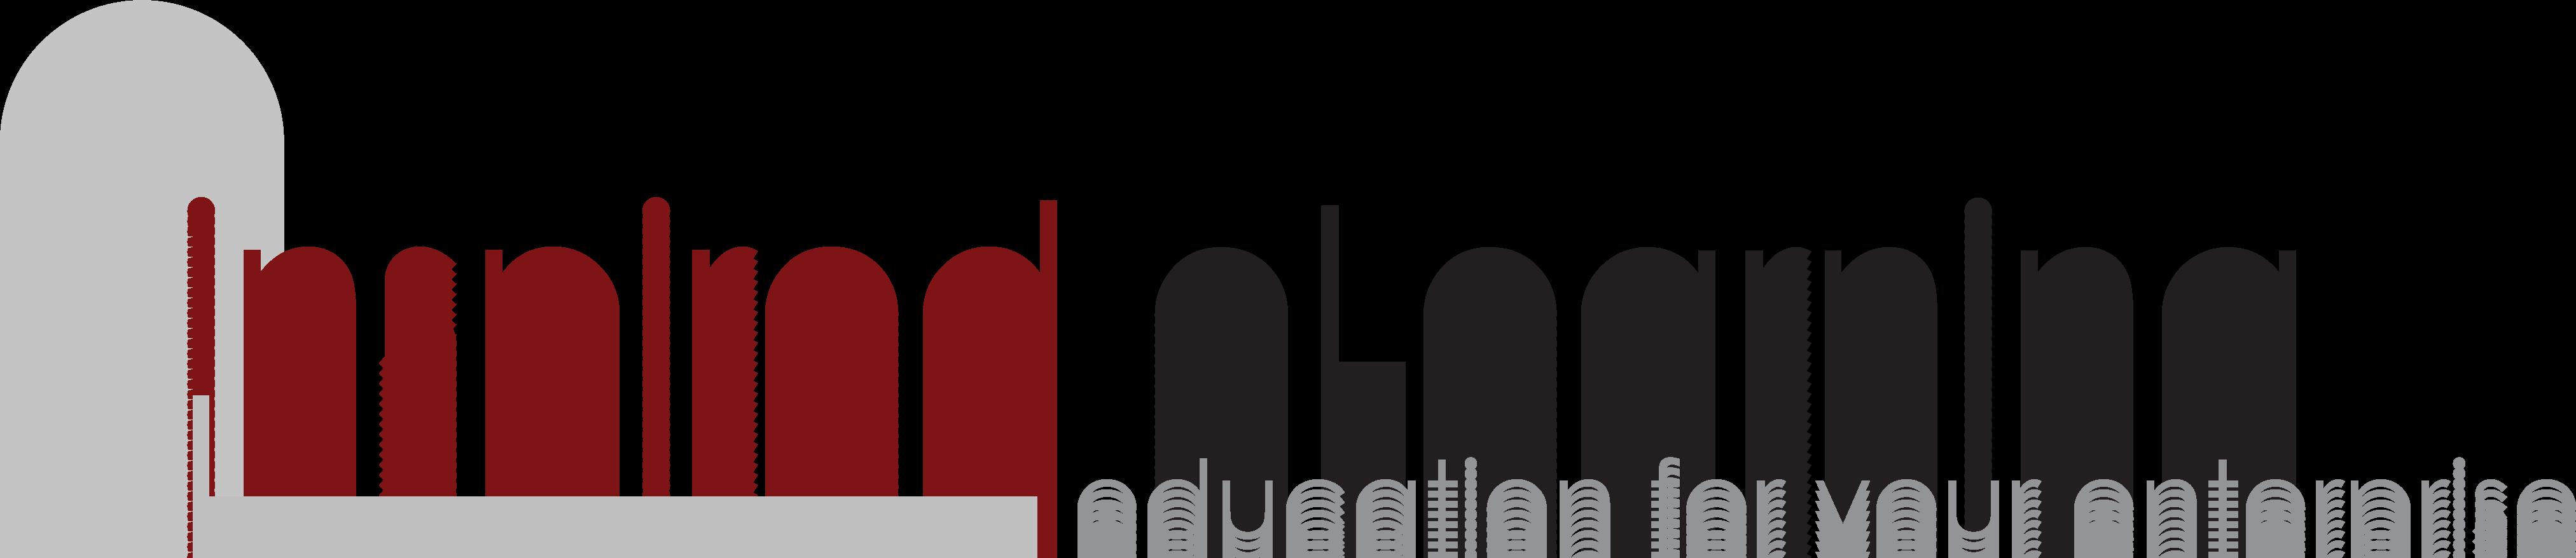 Inspired eLearning Logo